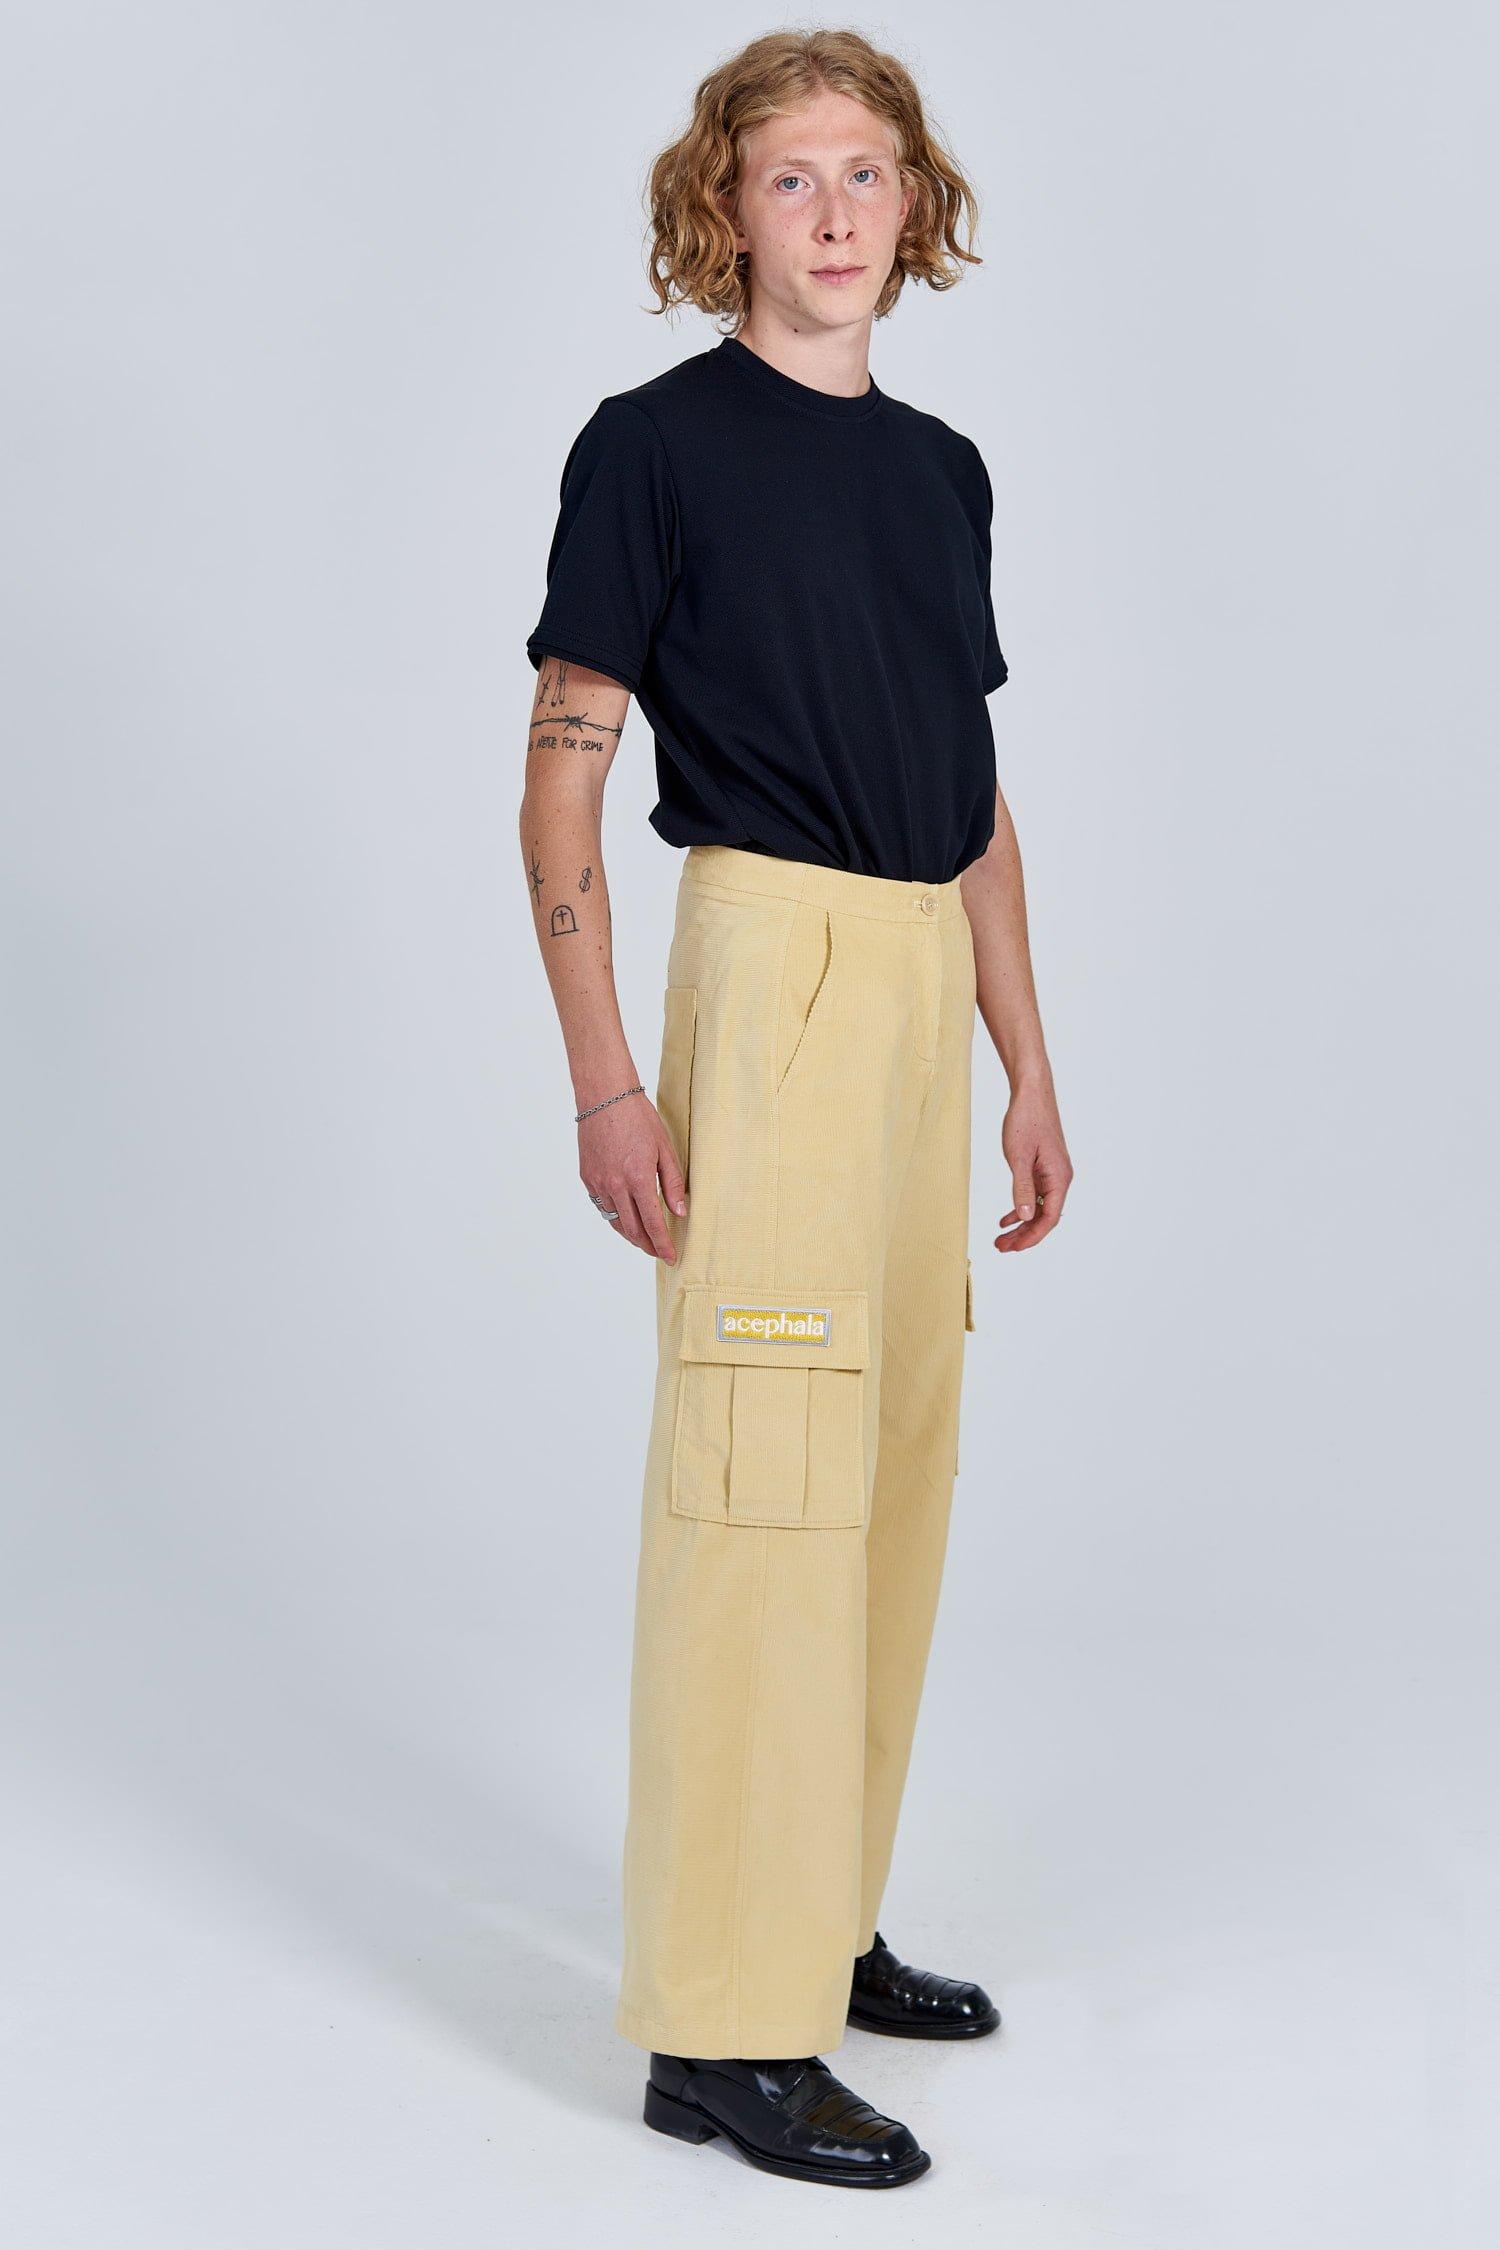 Acephala Fw 2020 21 Black Unisex T Shirt Yellow Corduroy Trousers Male Side